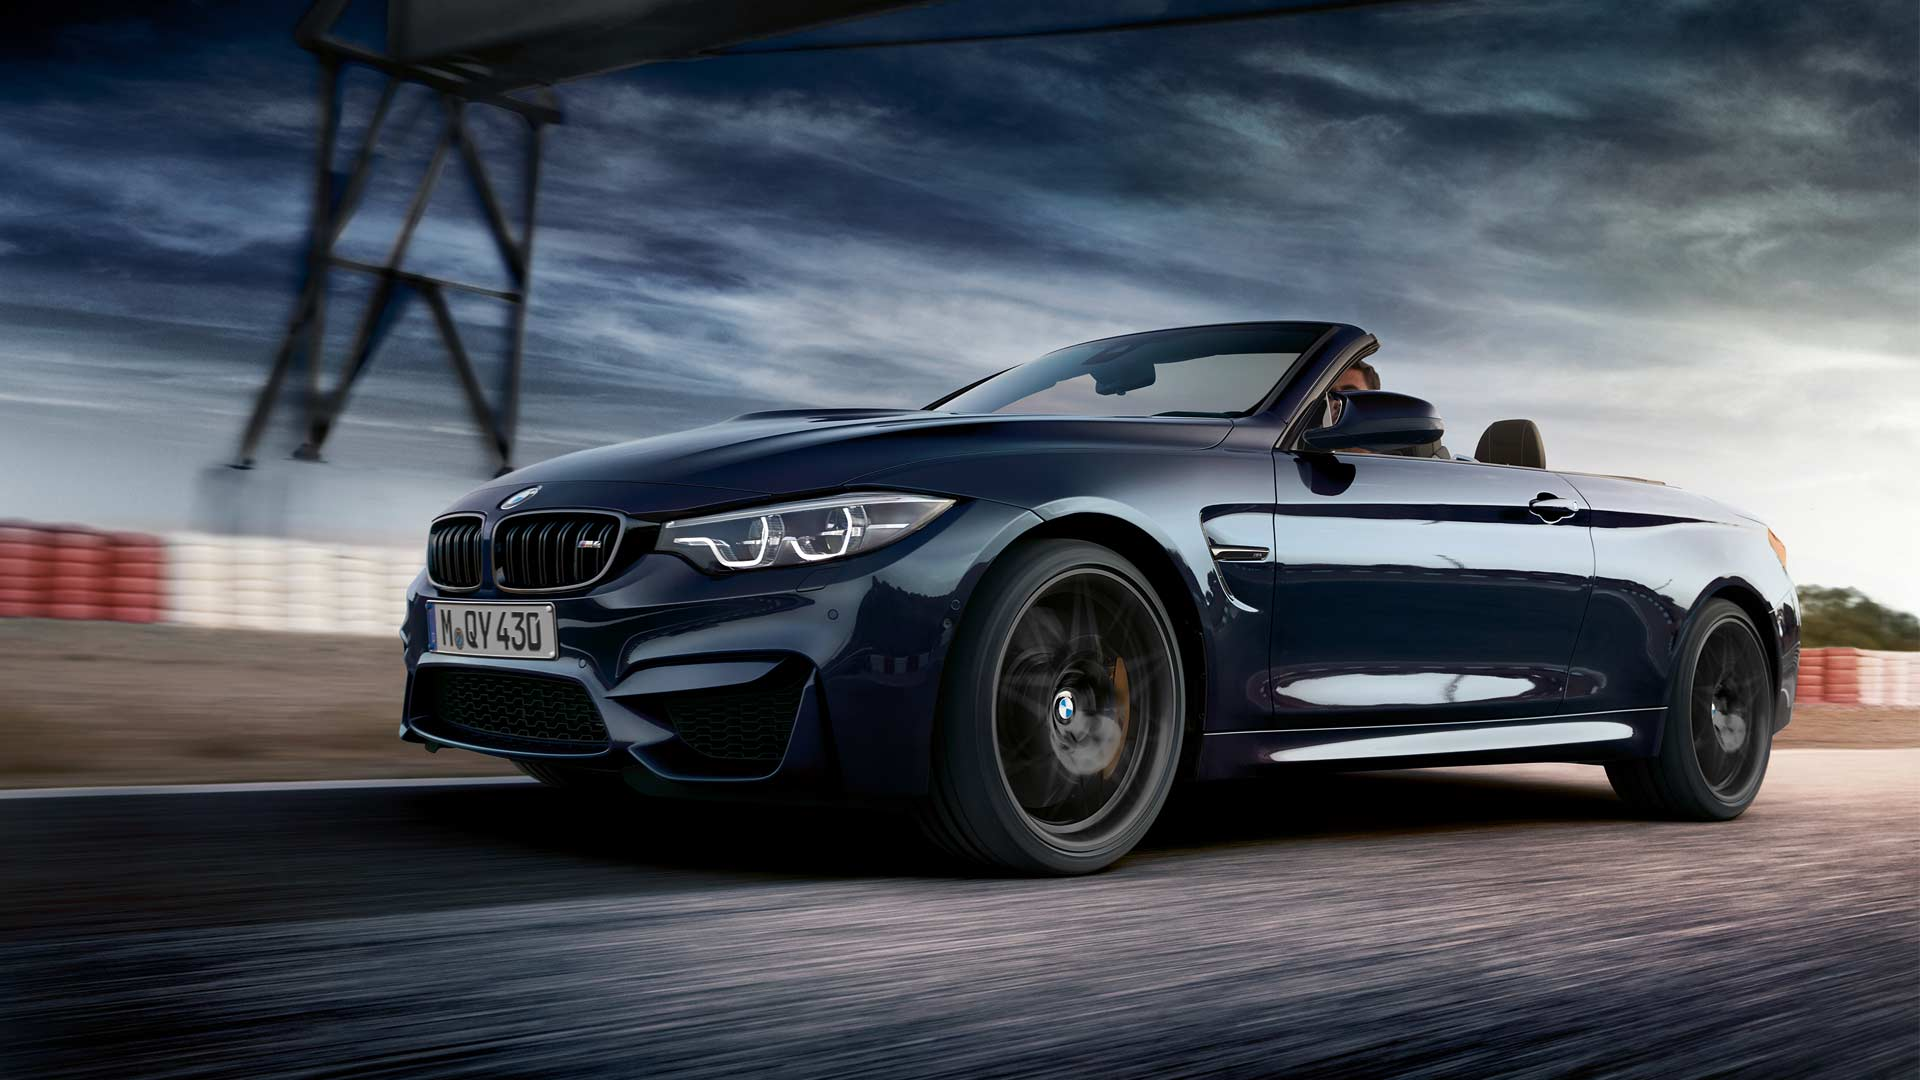 BMW-M4-Convertible-30-Jahre-Edition_2